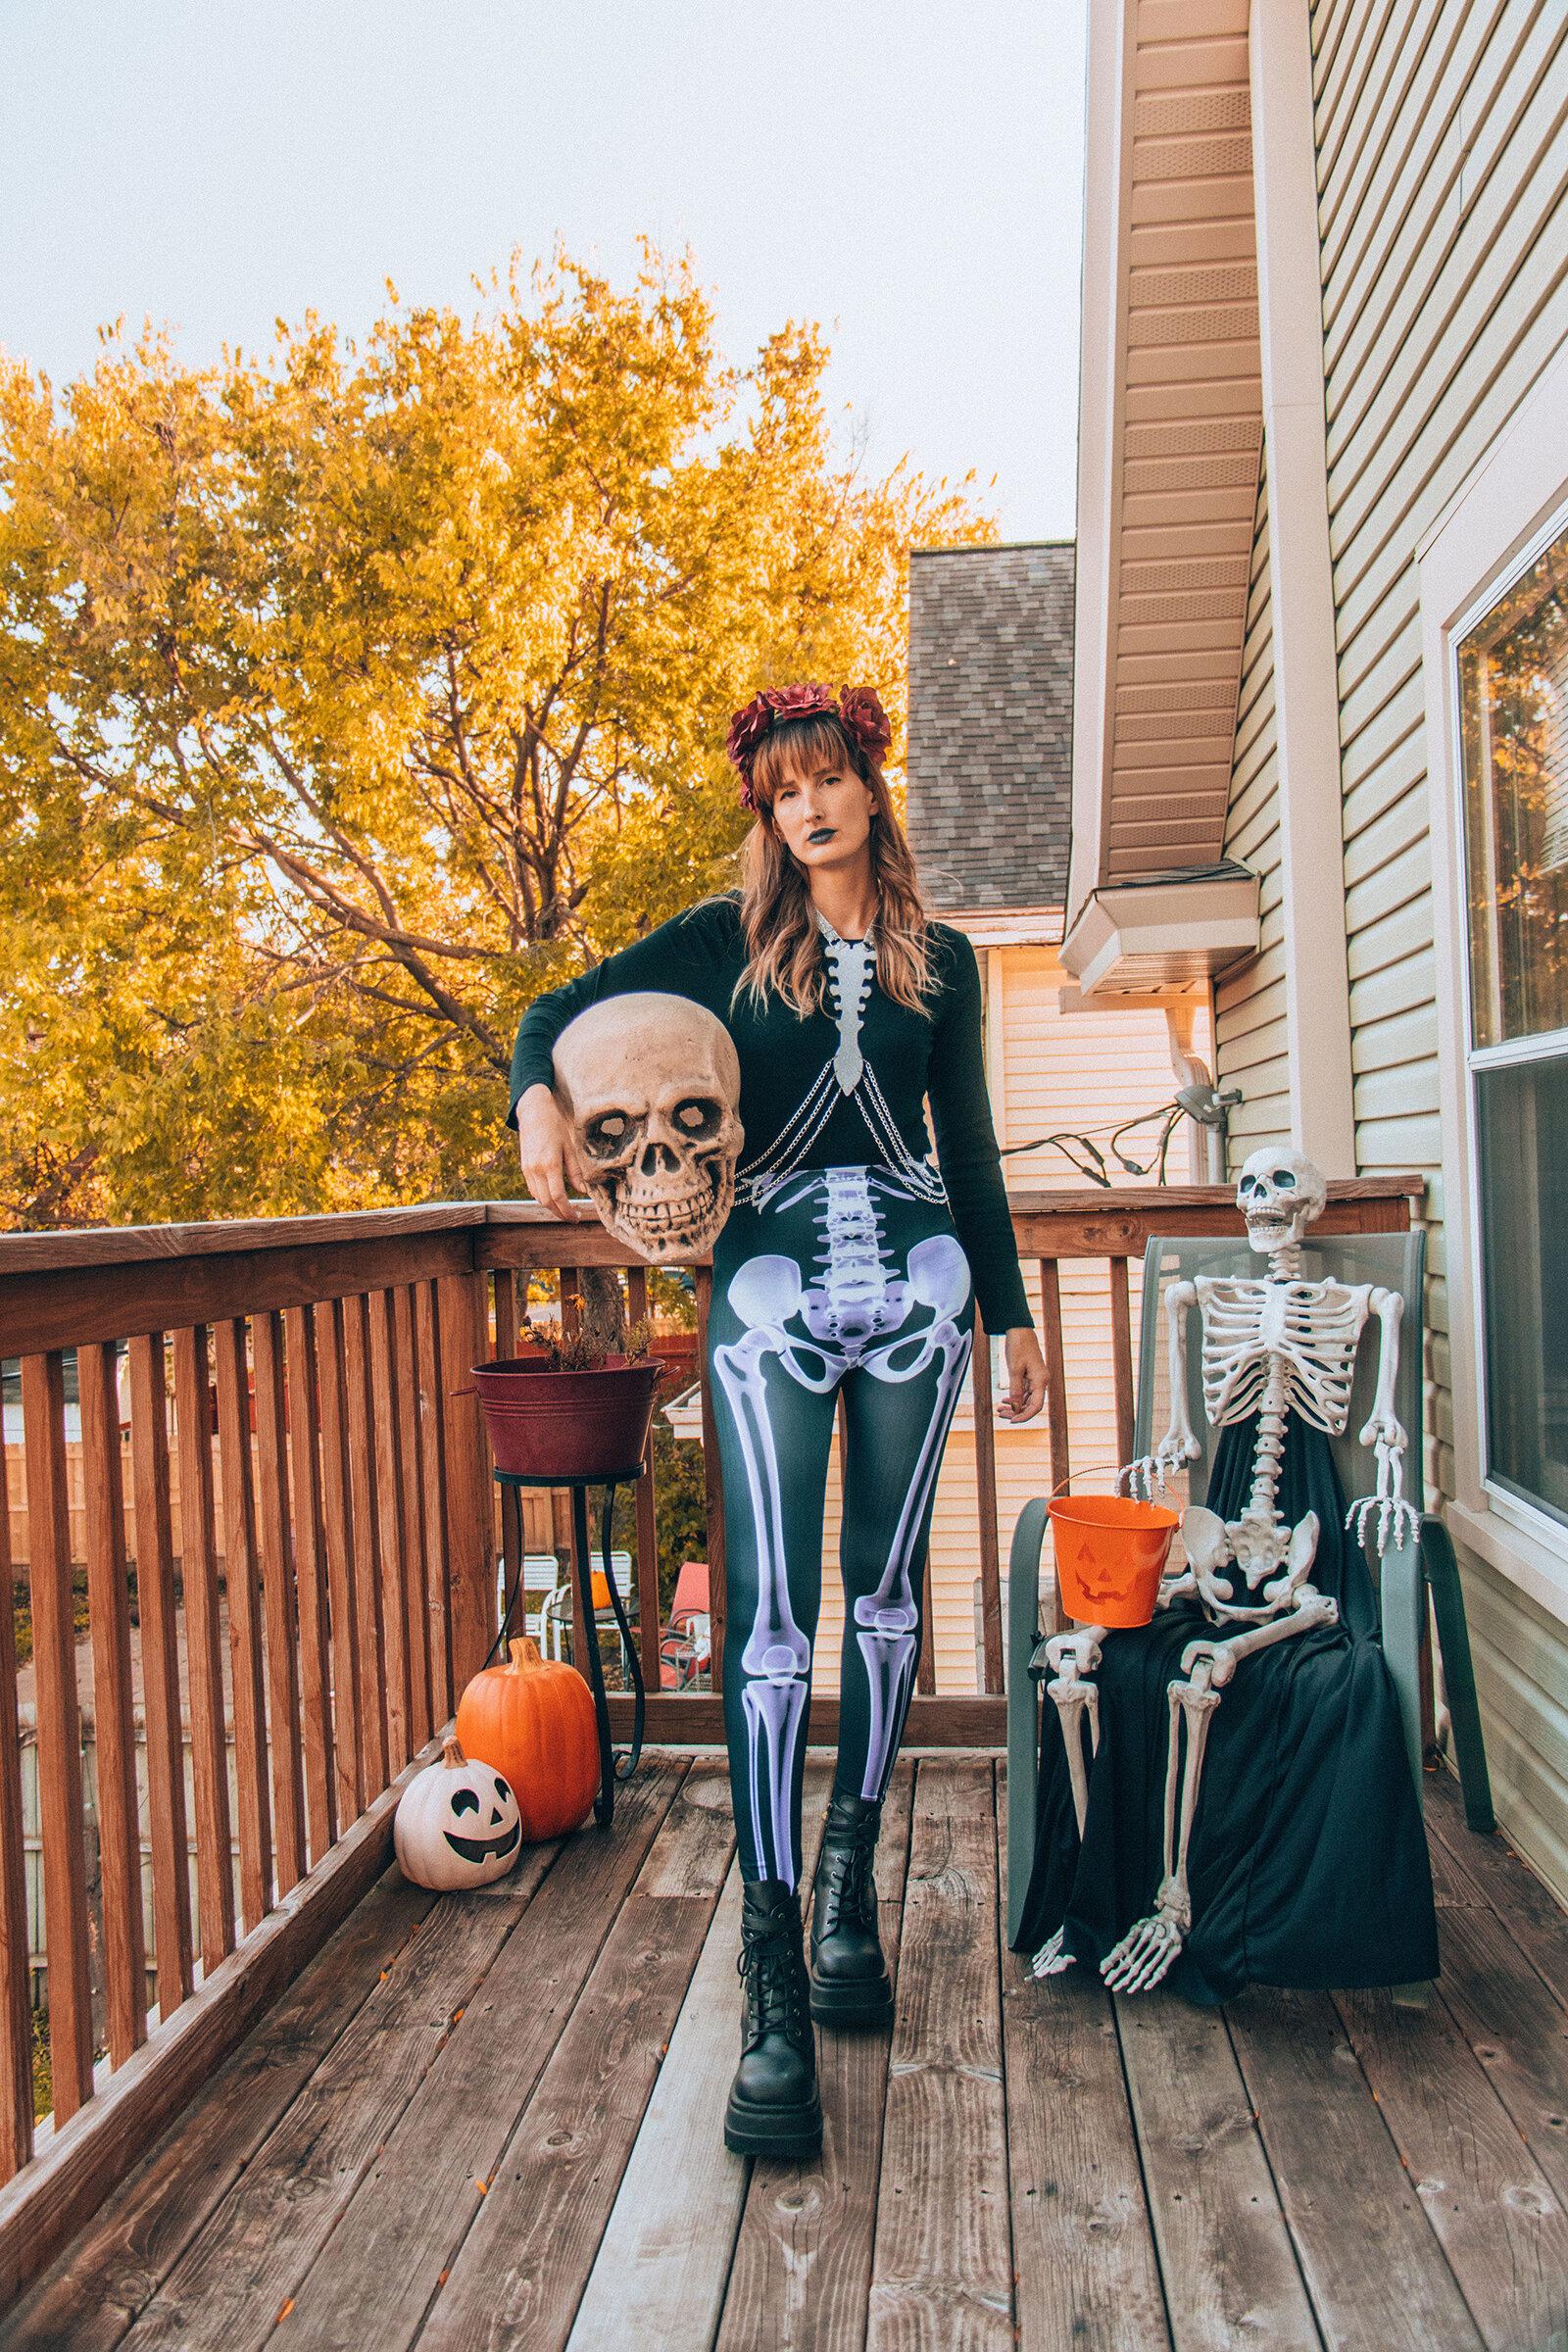 Skeleton_costume_2.jpg